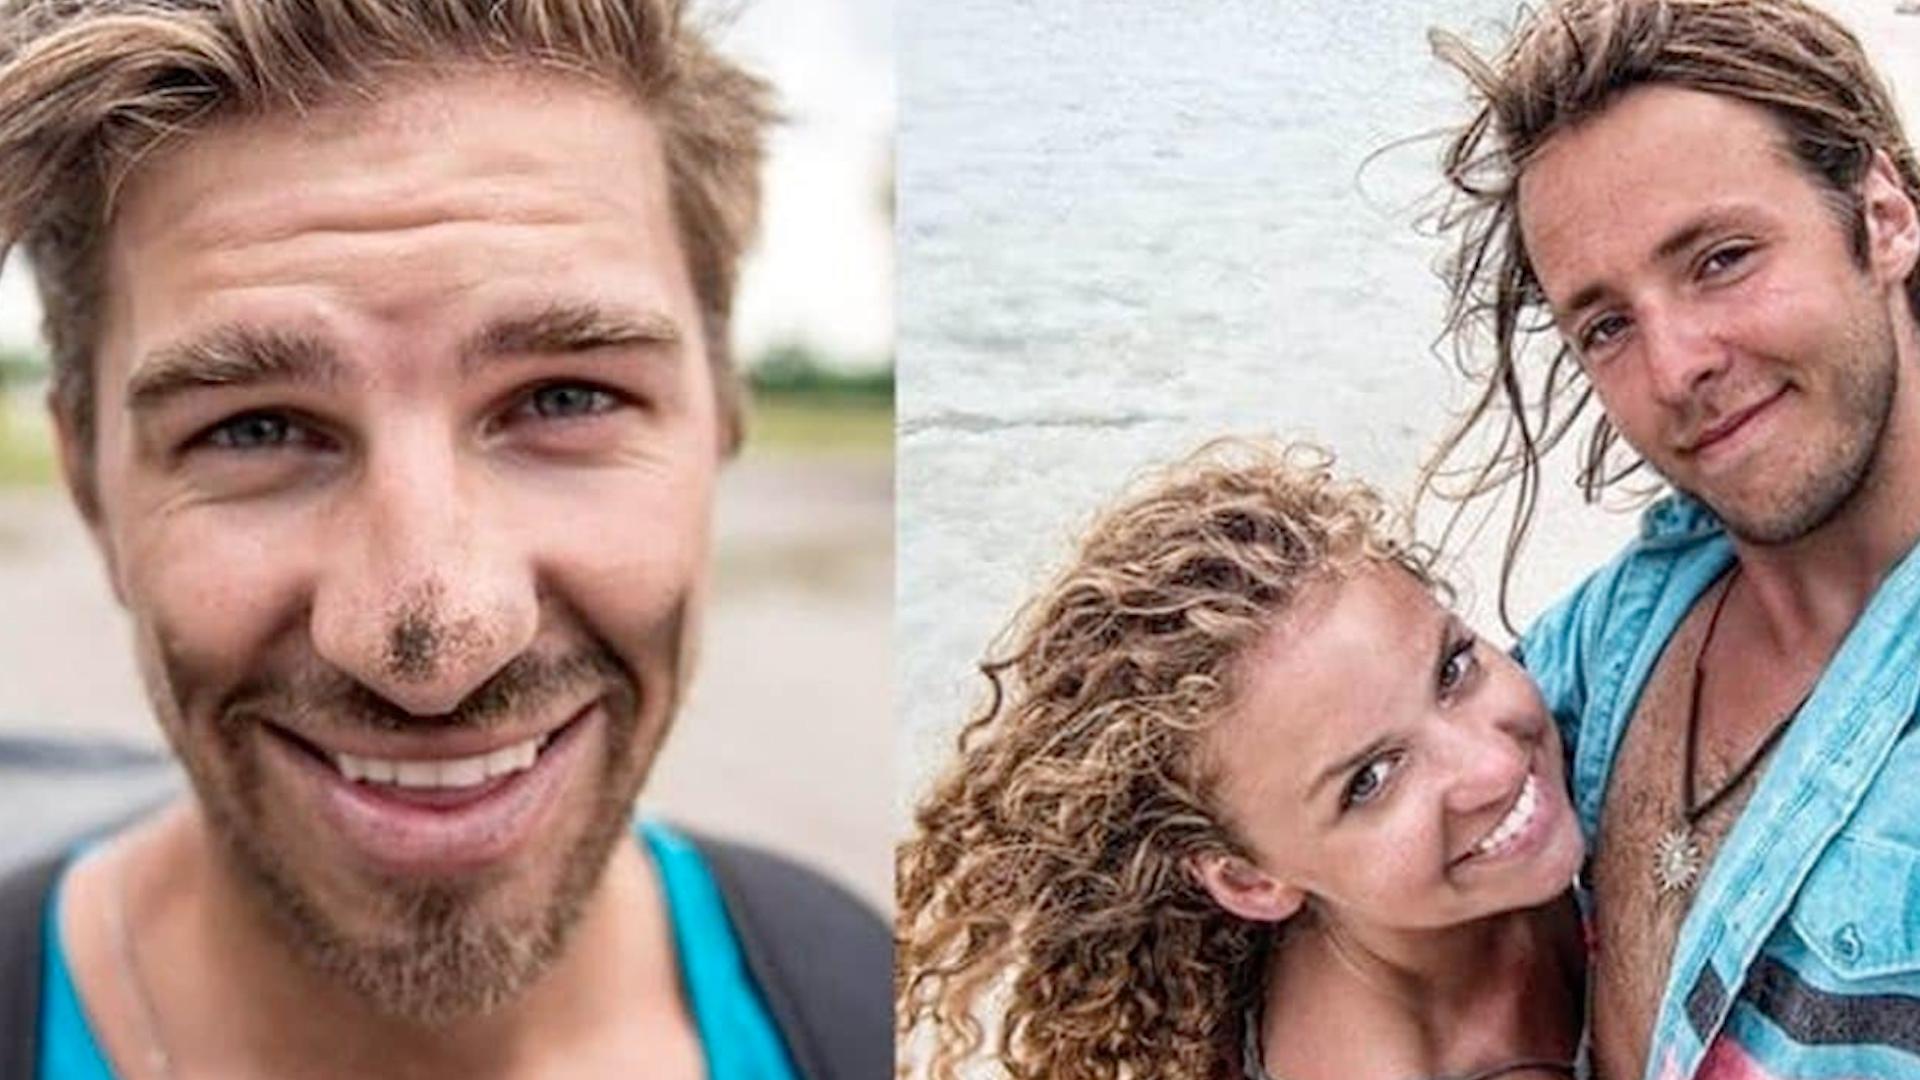 Adventure-seeking YouTube stars killed in waterfall accident